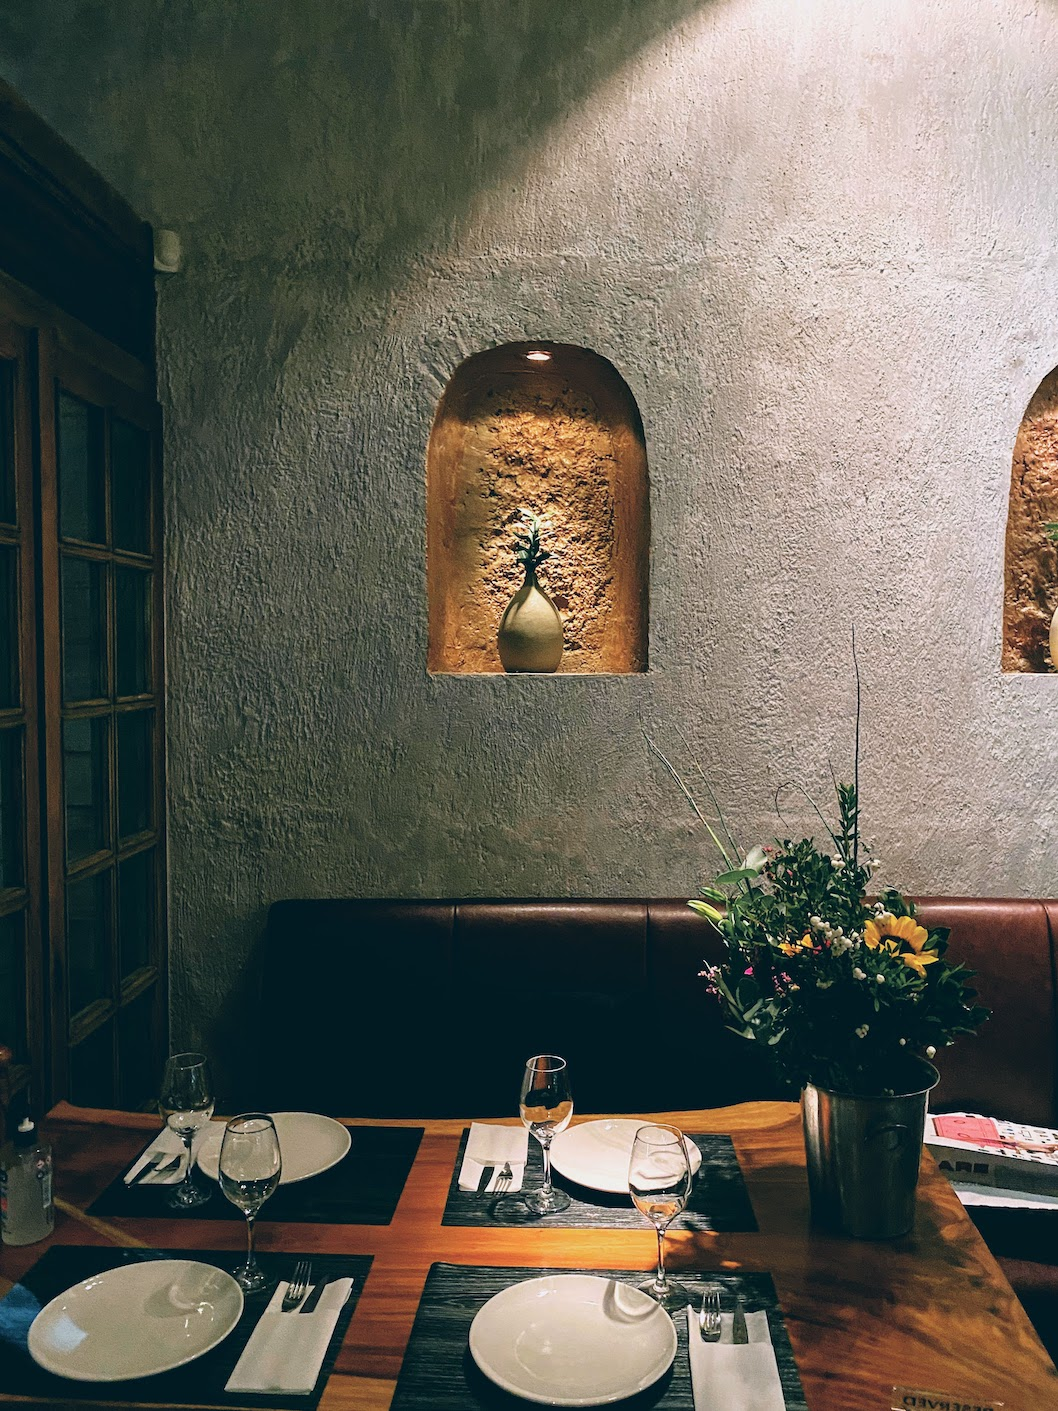 Travel Food People - L'Albero, Thessaloniki